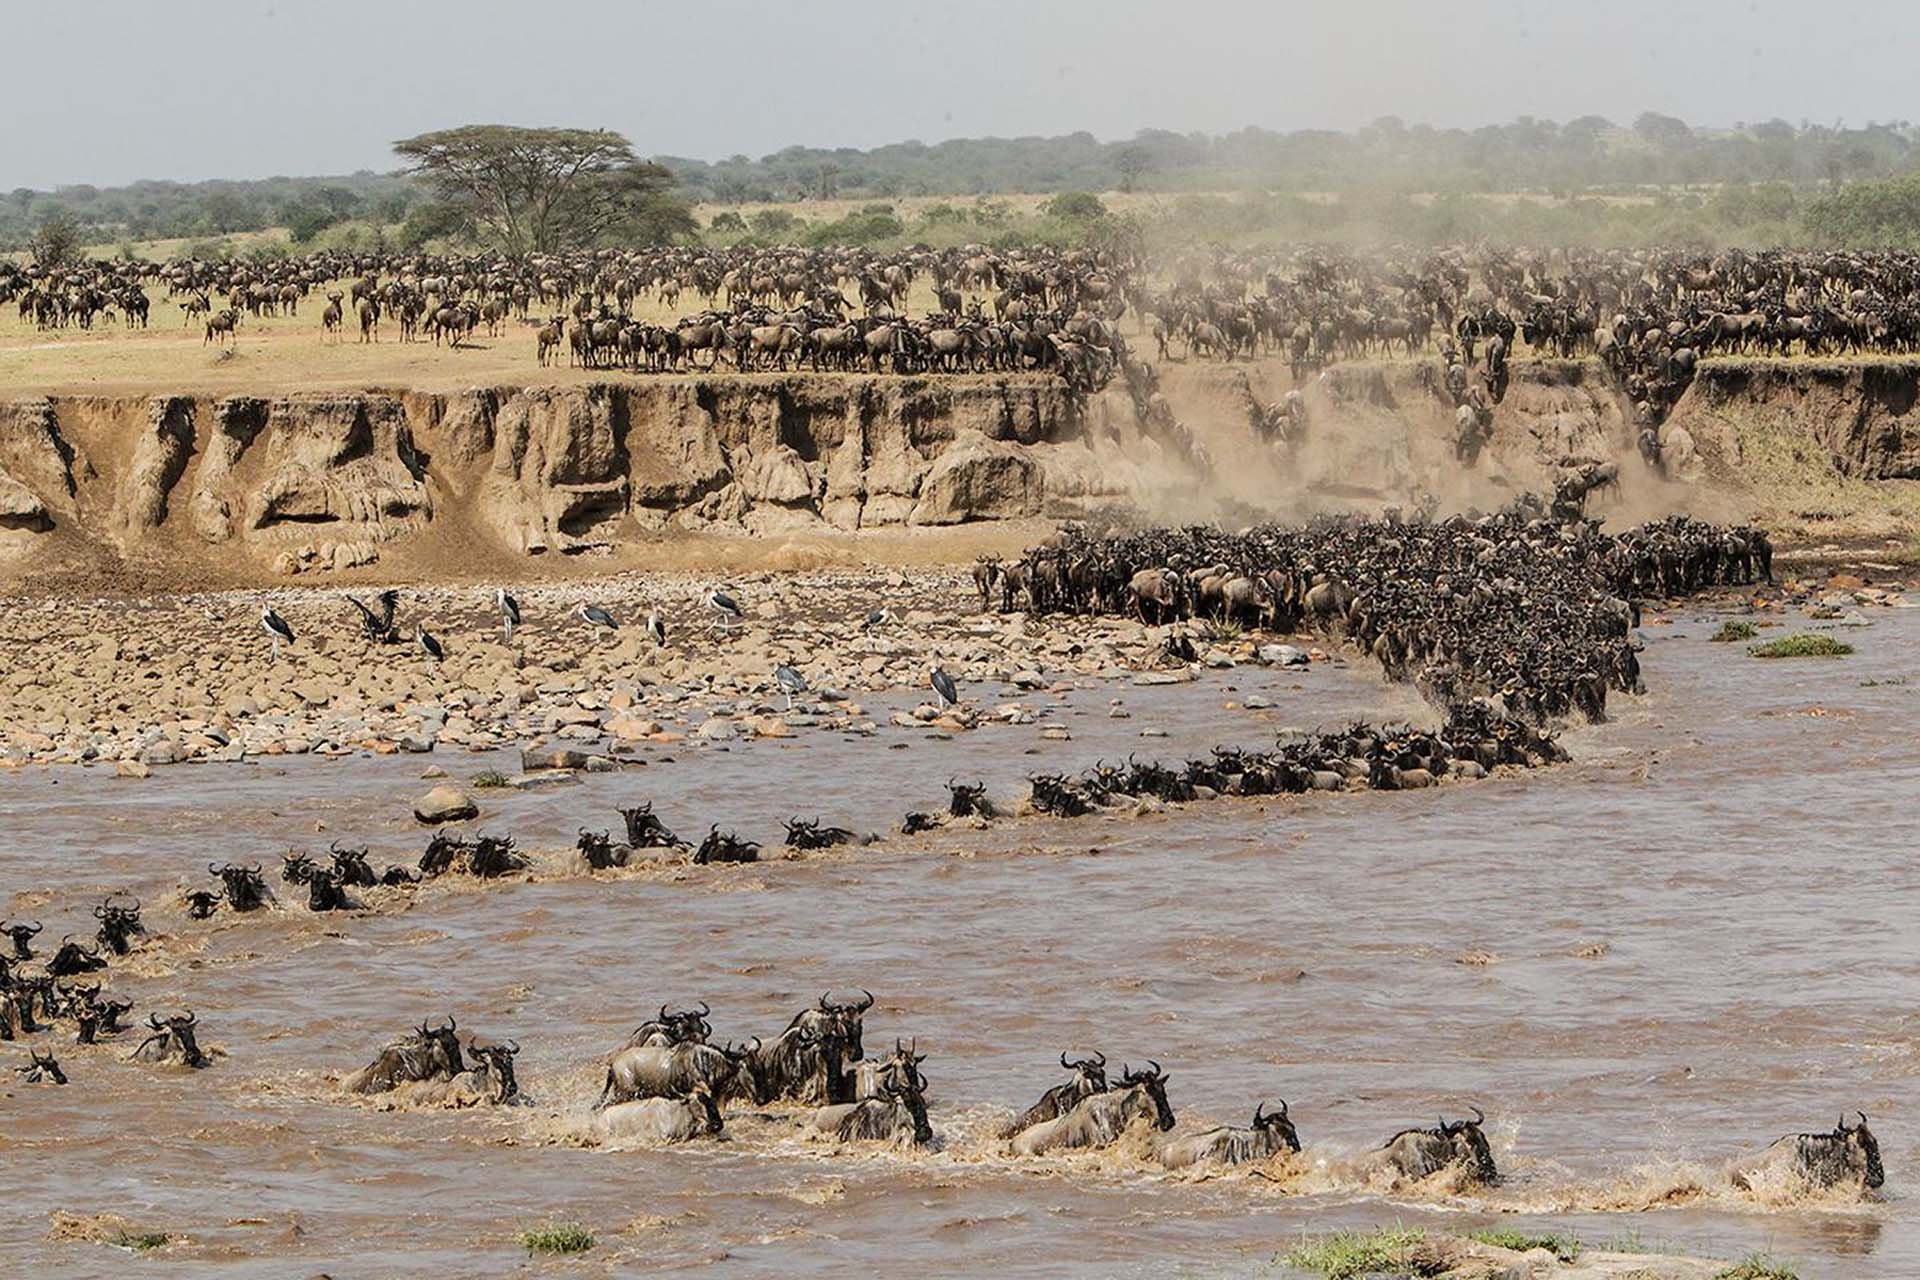 tom-whetten-photography-signature-photo-safaris-maasai-wanderings-africa-wildebeest-wildlife